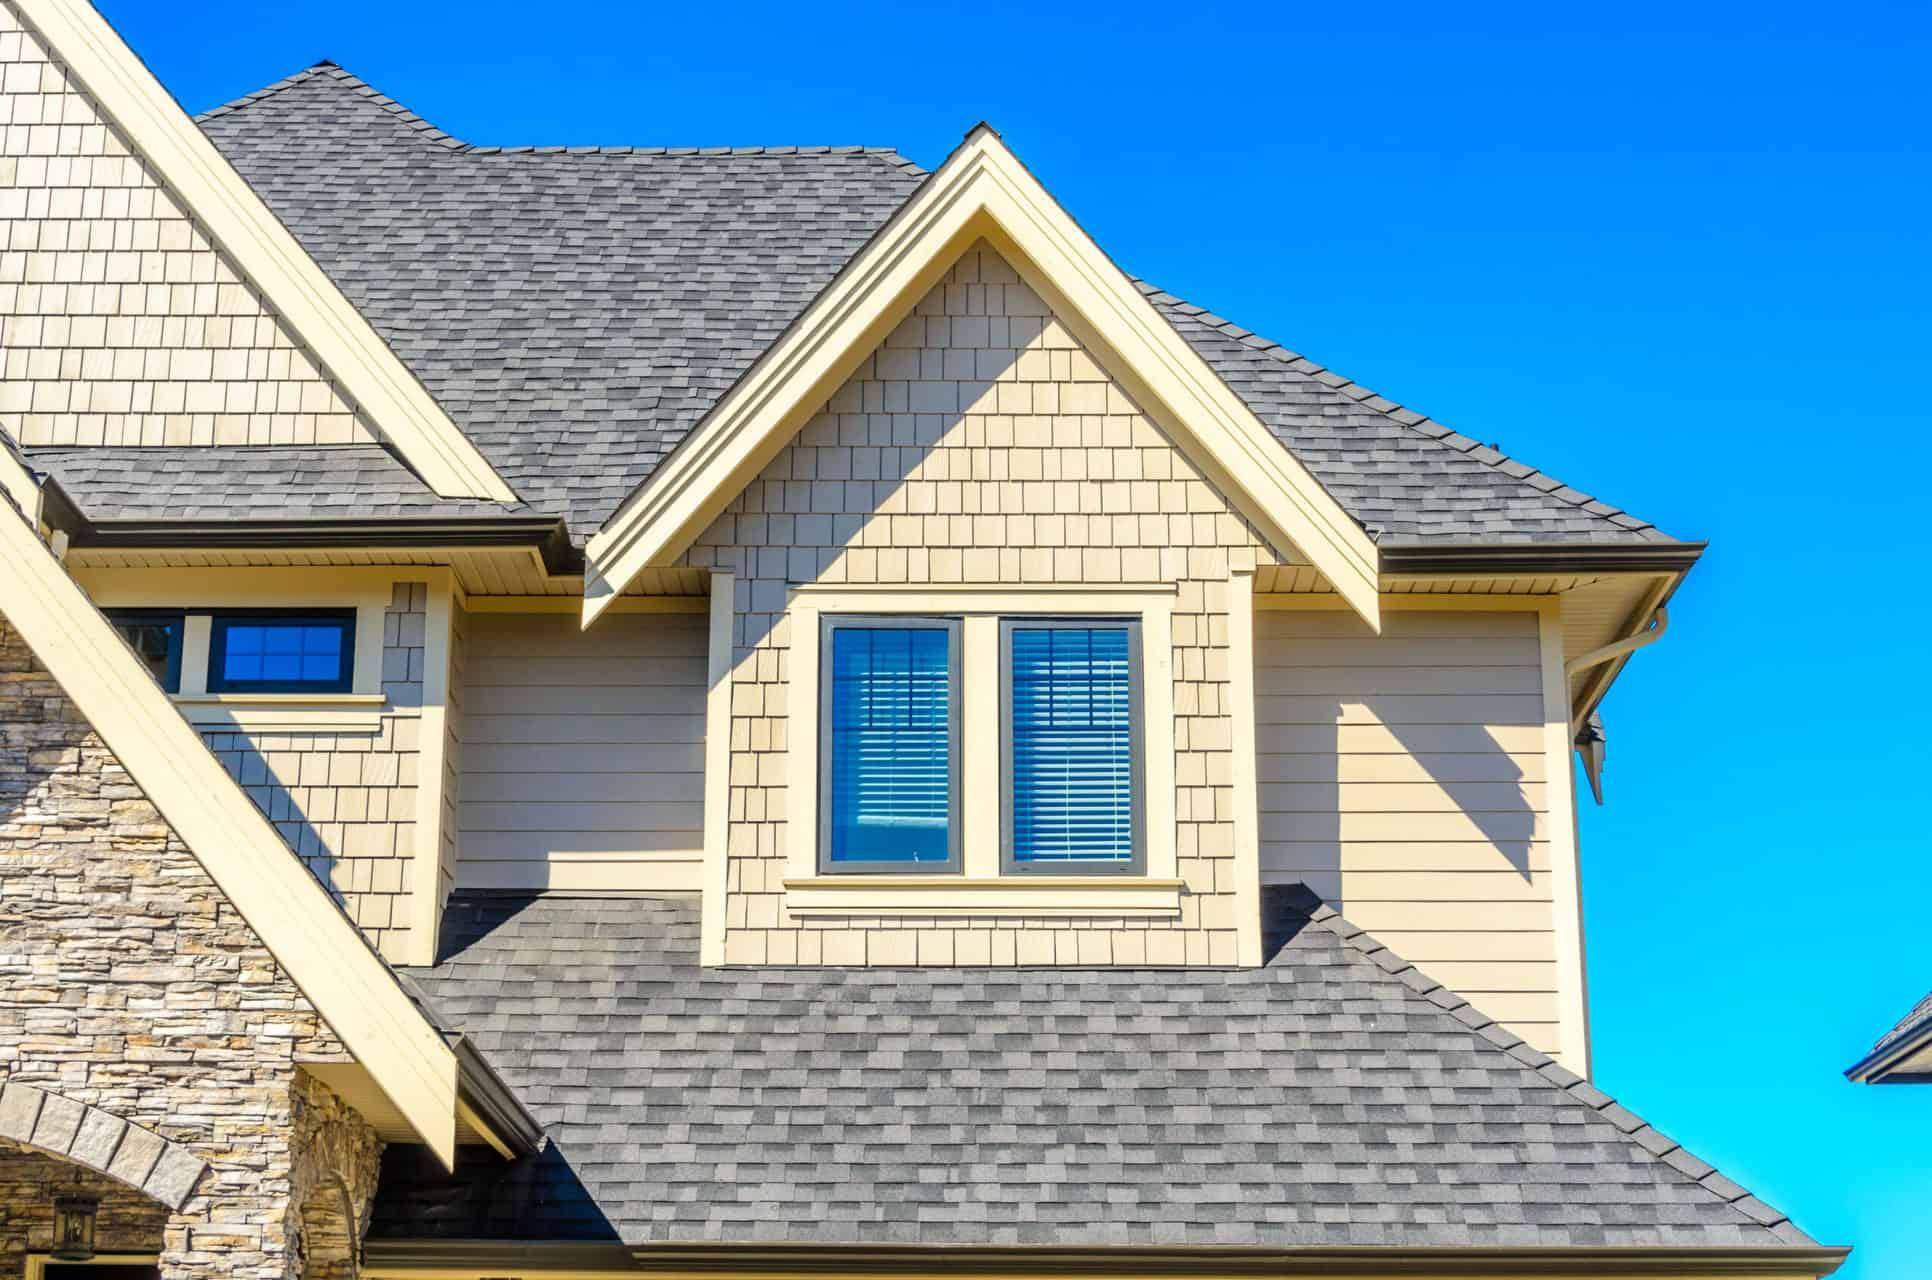 house with shingle roof